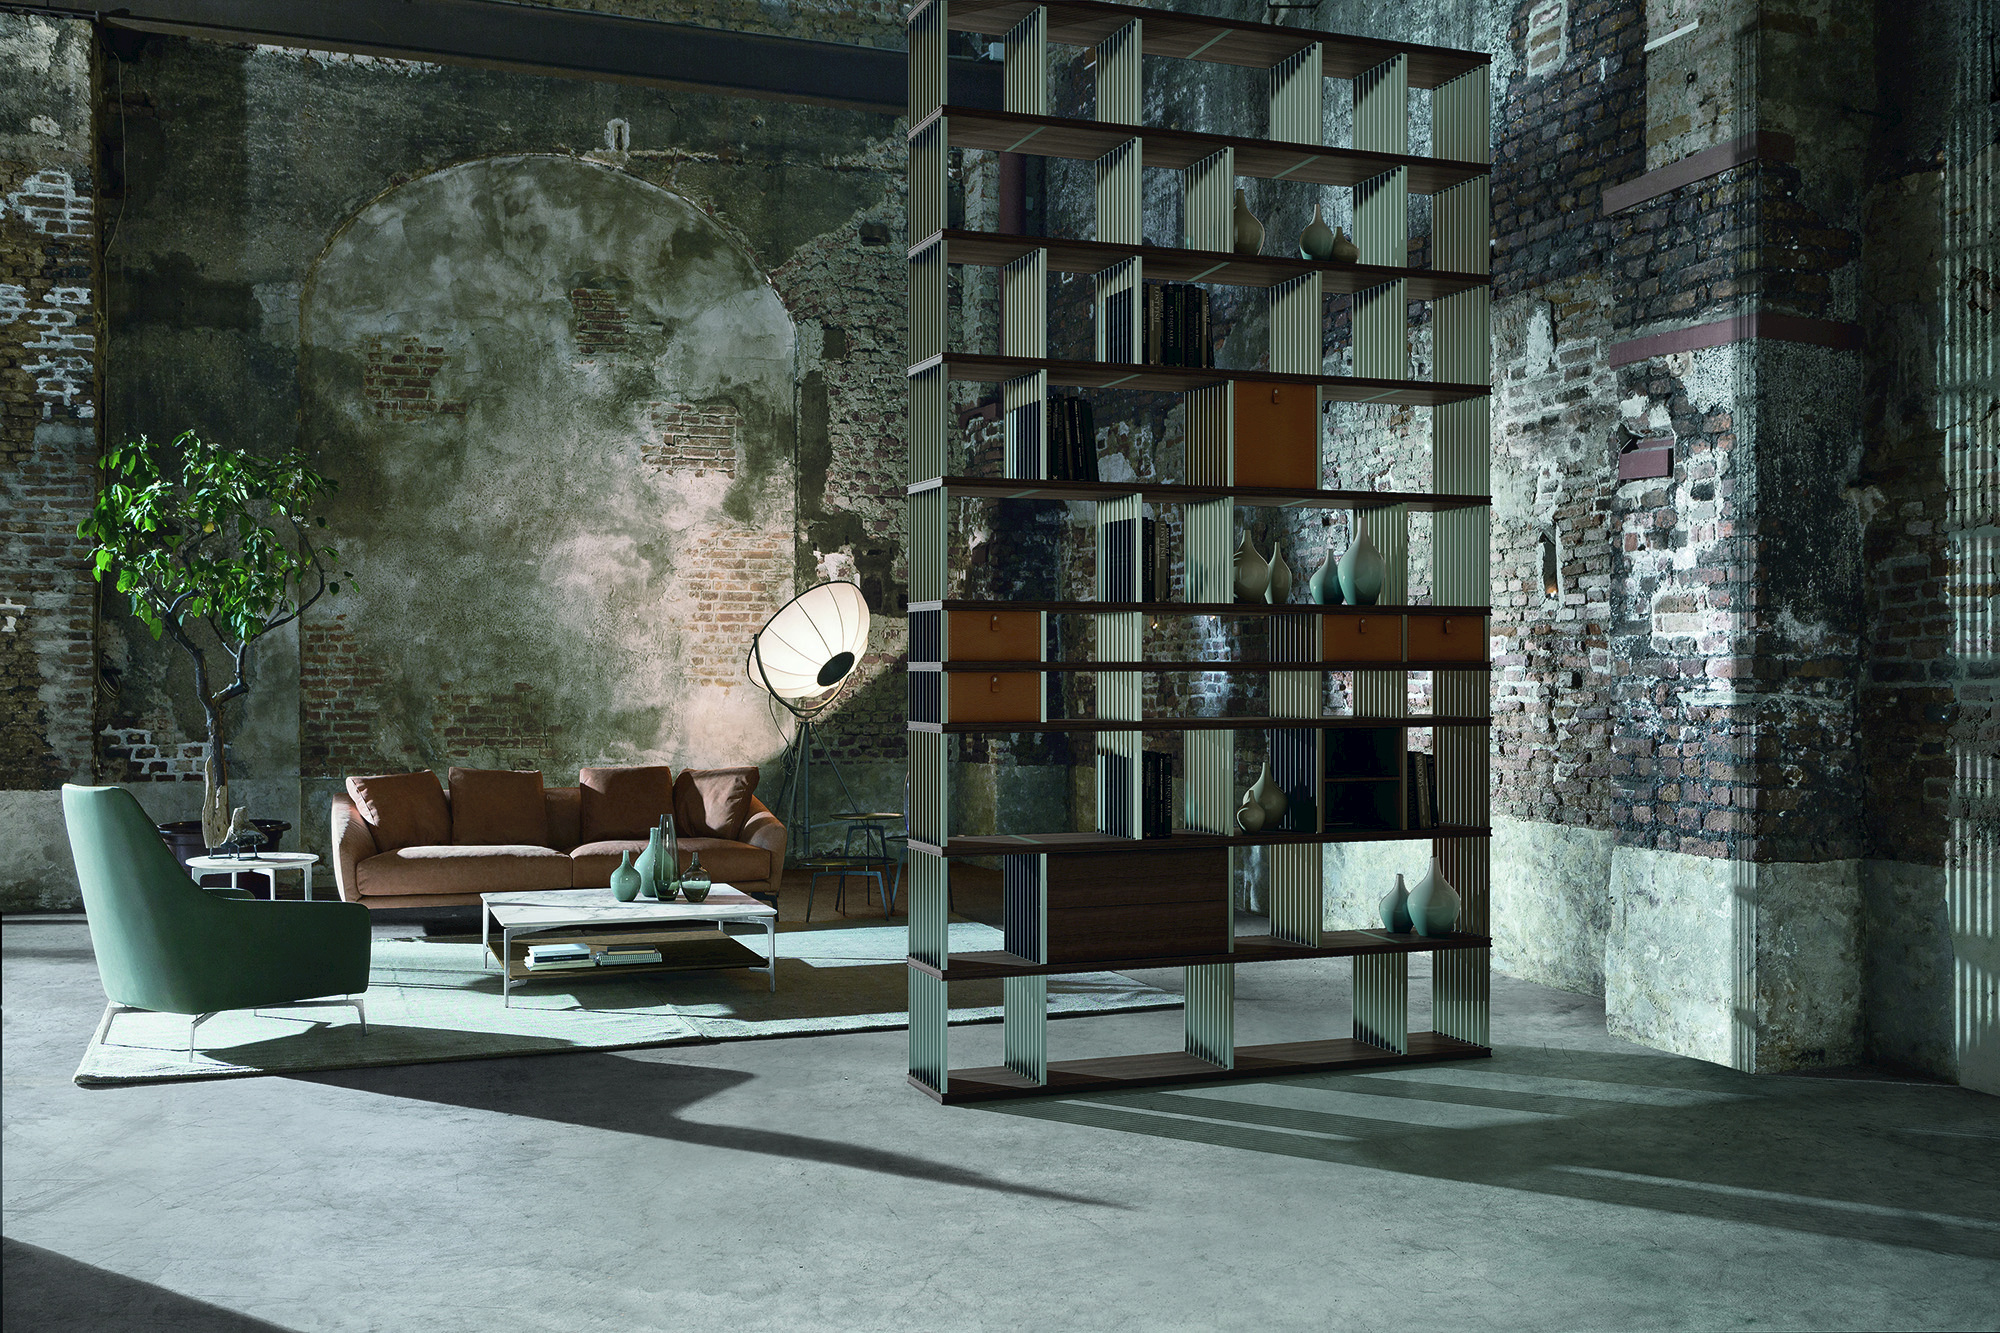 freistehendes double sided b cherregal aus stahl und holz. Black Bedroom Furniture Sets. Home Design Ideas